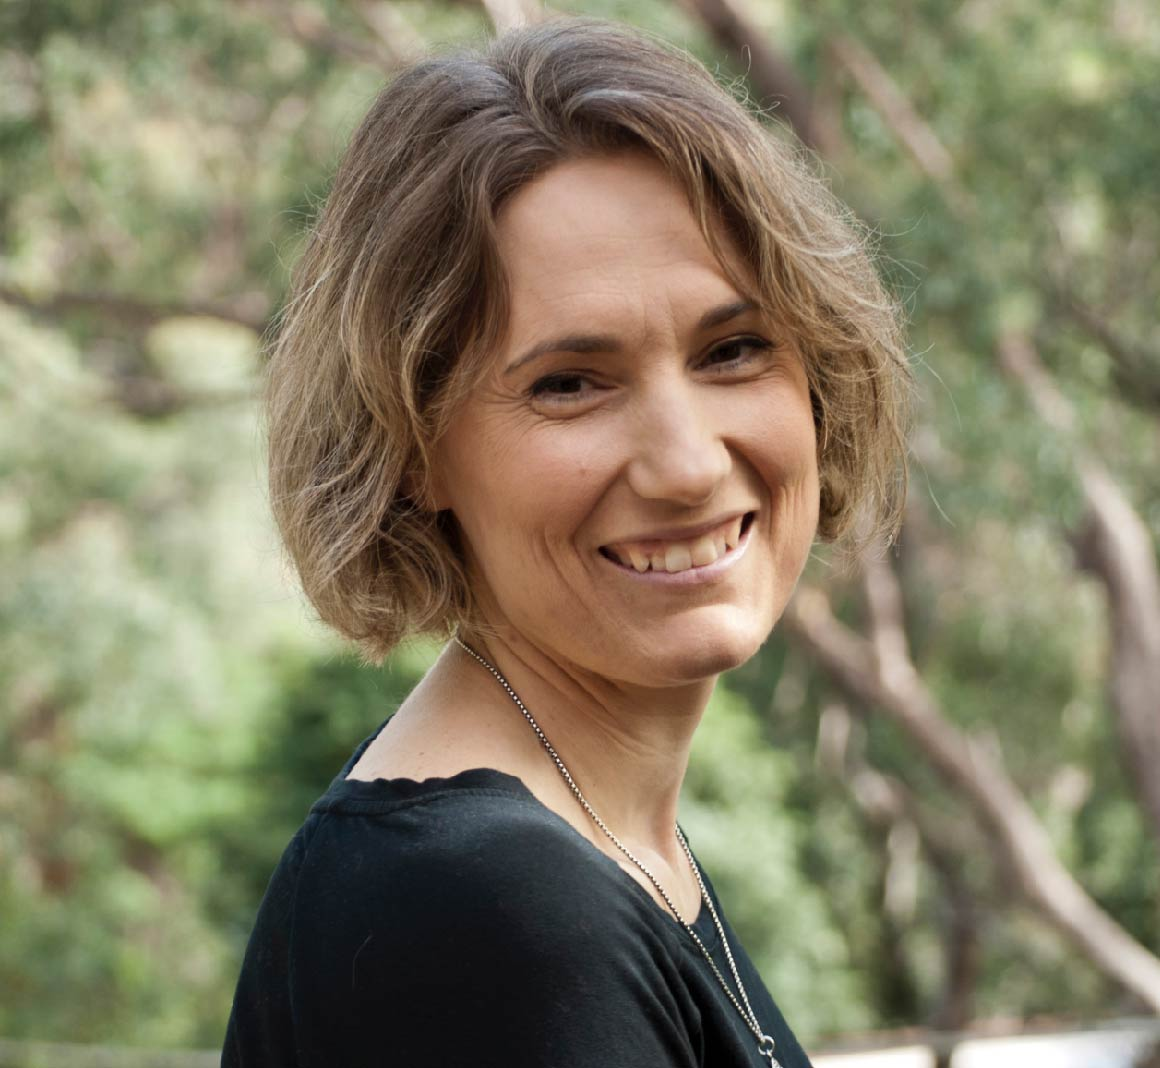 Dr Joanna Cooper B.Sc., M.Chir.